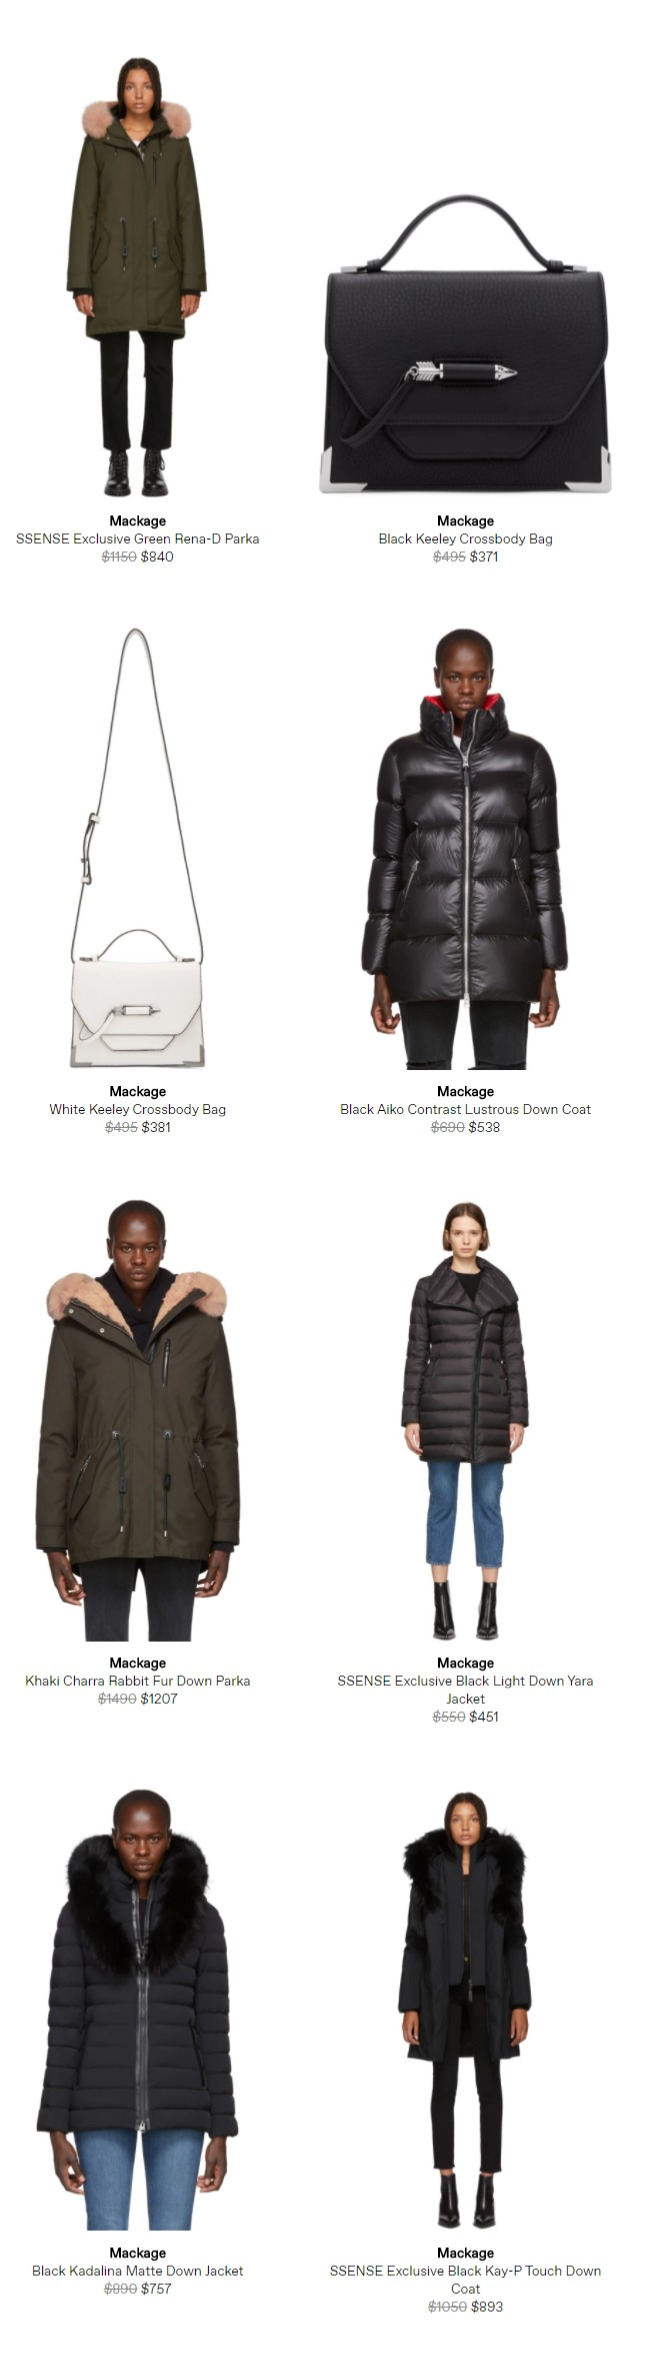 SSENSE精选Mackage 全场男女时尚羽绒服、美包 5.6折起优惠,羽绒服低至 450加元!